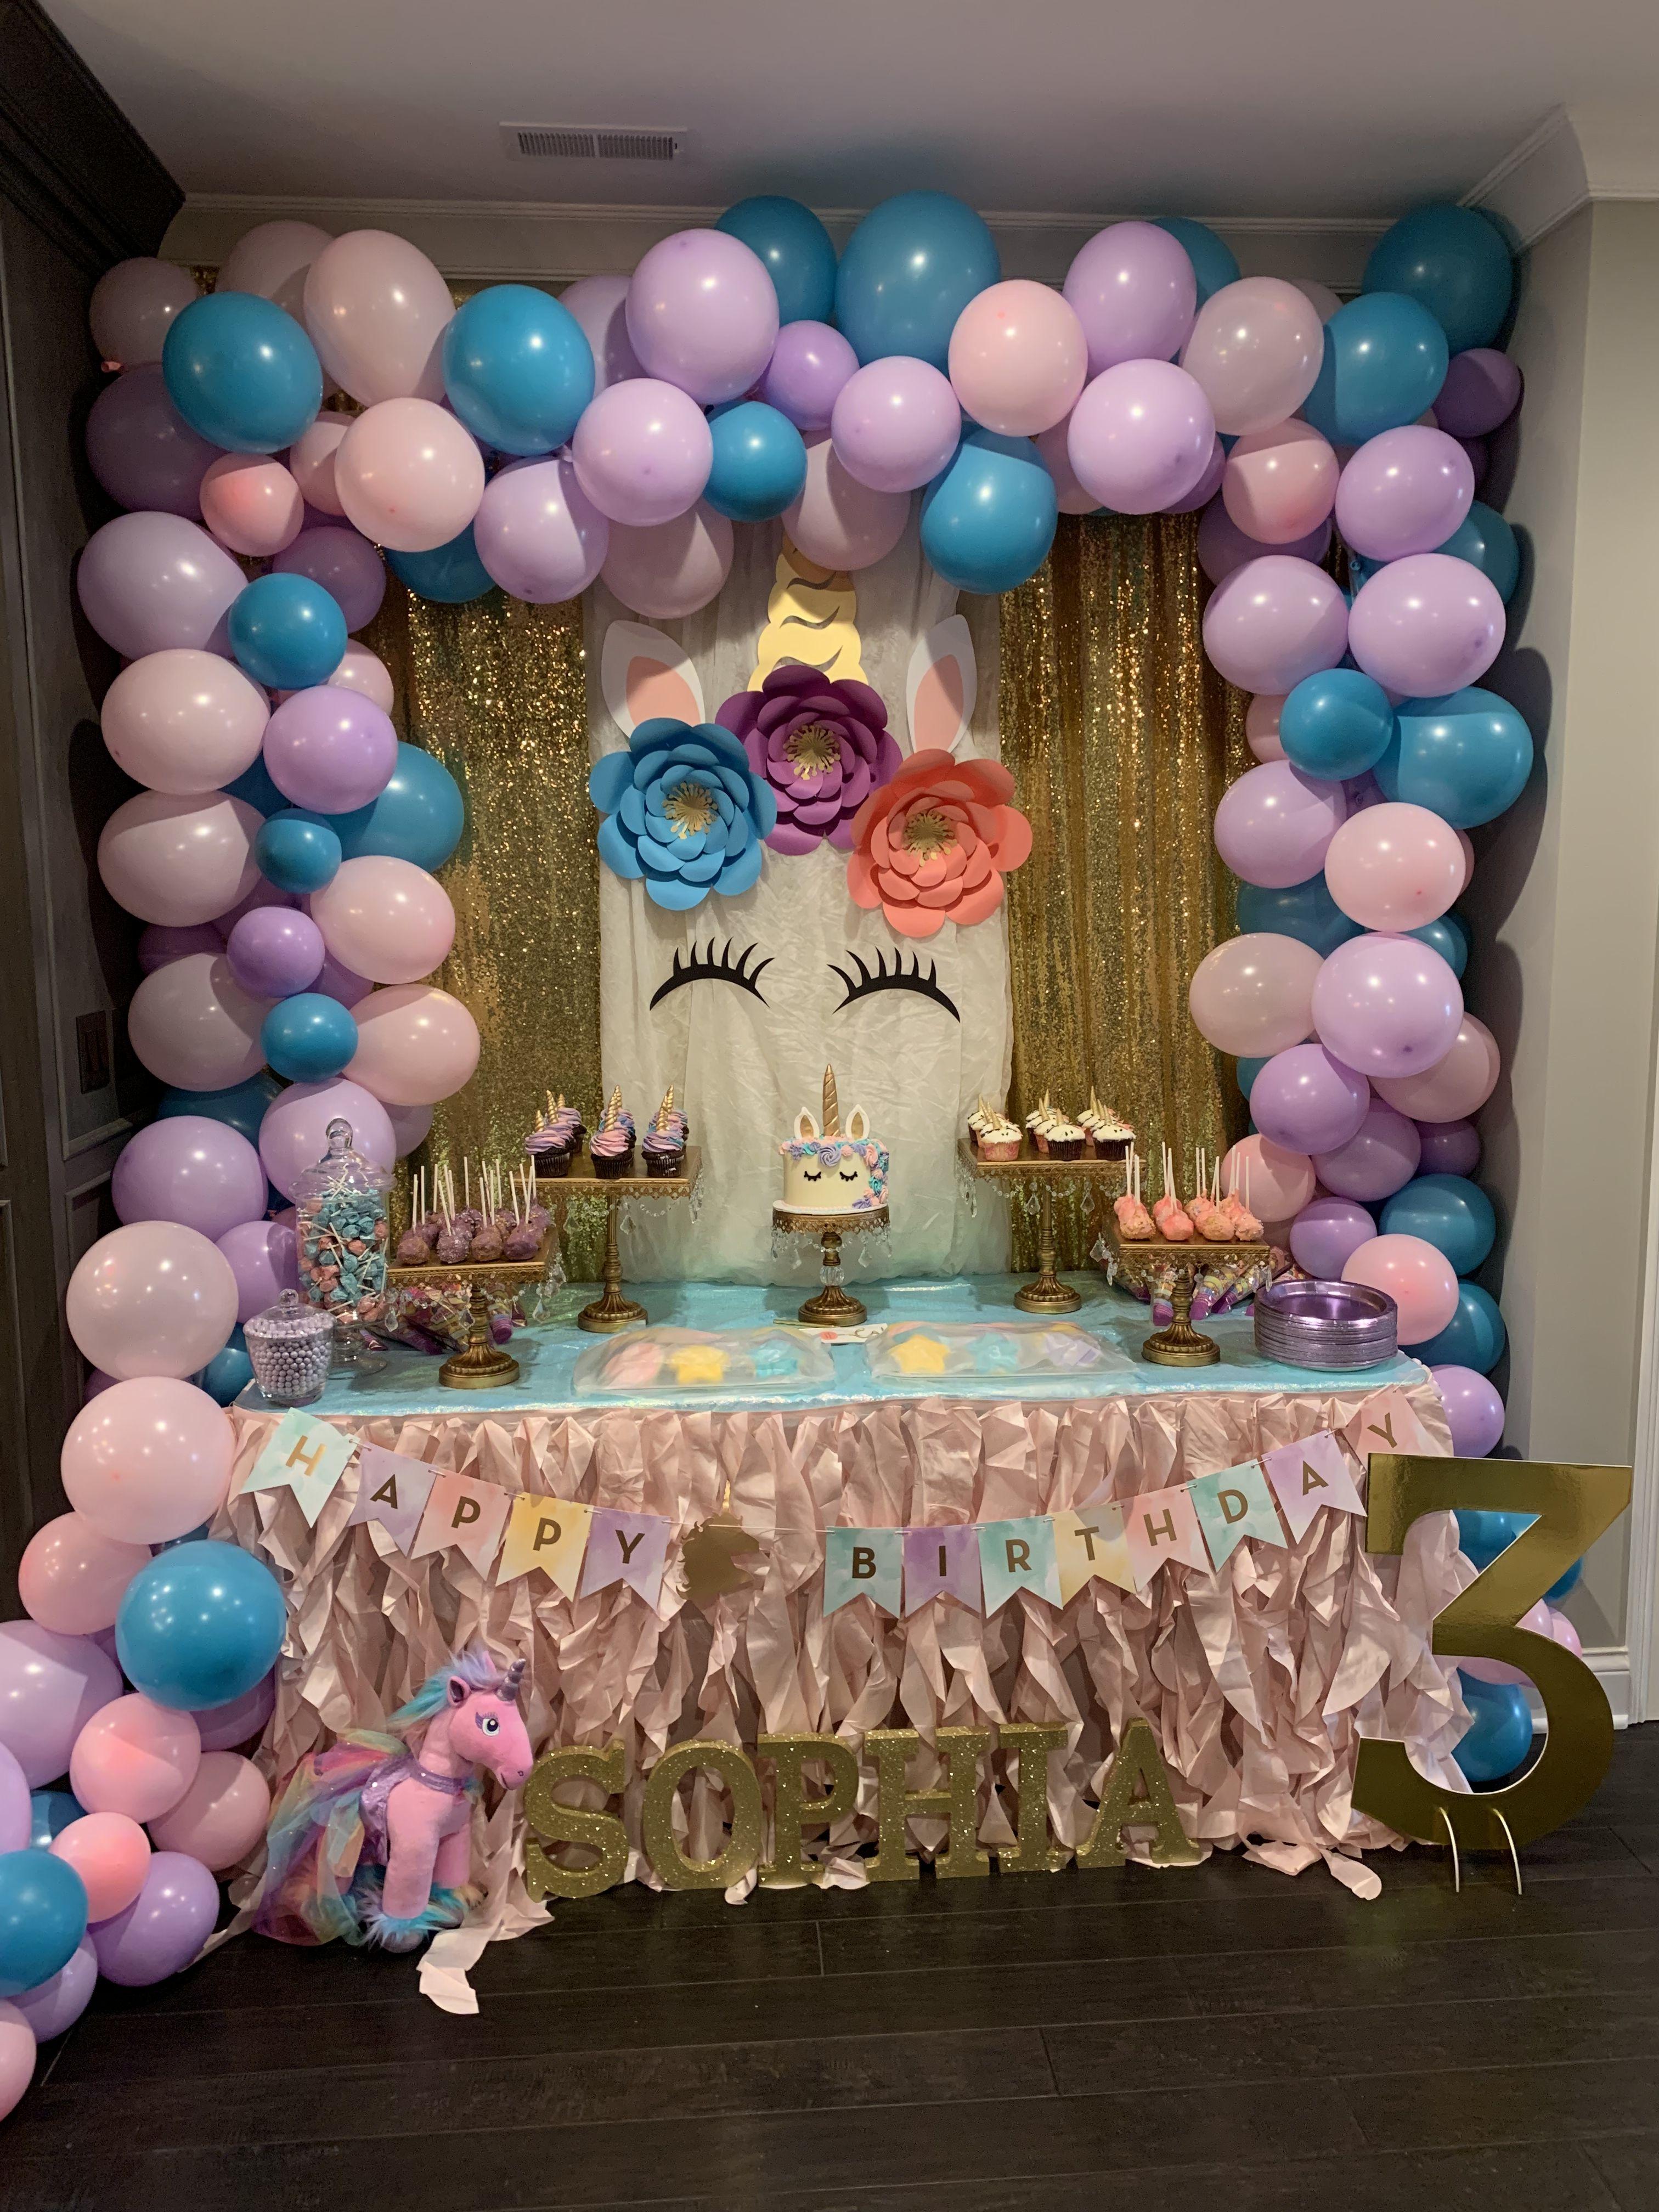 Unicorn Birthday Party Unicorn Themed Birthday Party Unicorn Birthday Party Decorations Unicorn Birthday Decorations